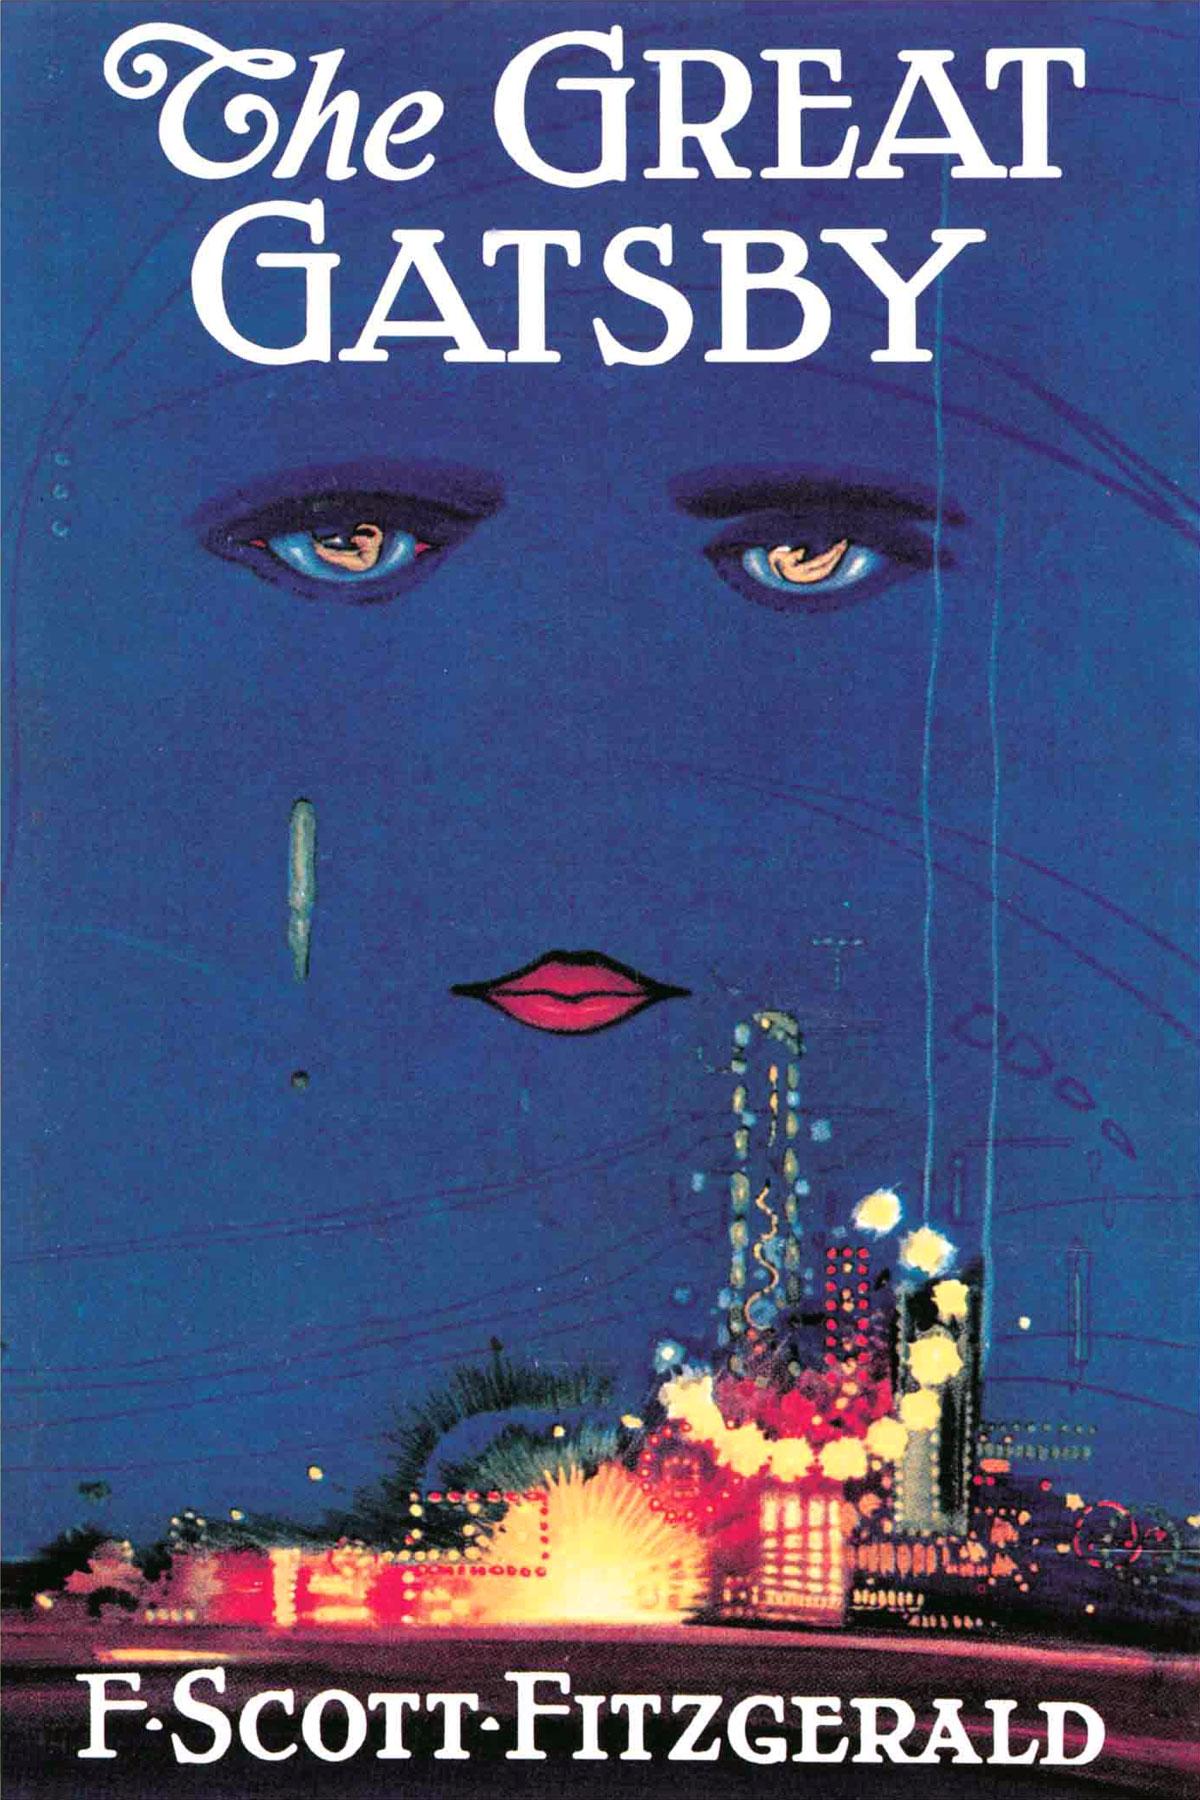 Francis Scott Fitzgerald - Il Grande Gatsby, [Doc Epub Lit Mobi Pdf - Ita Eng] Romanzo